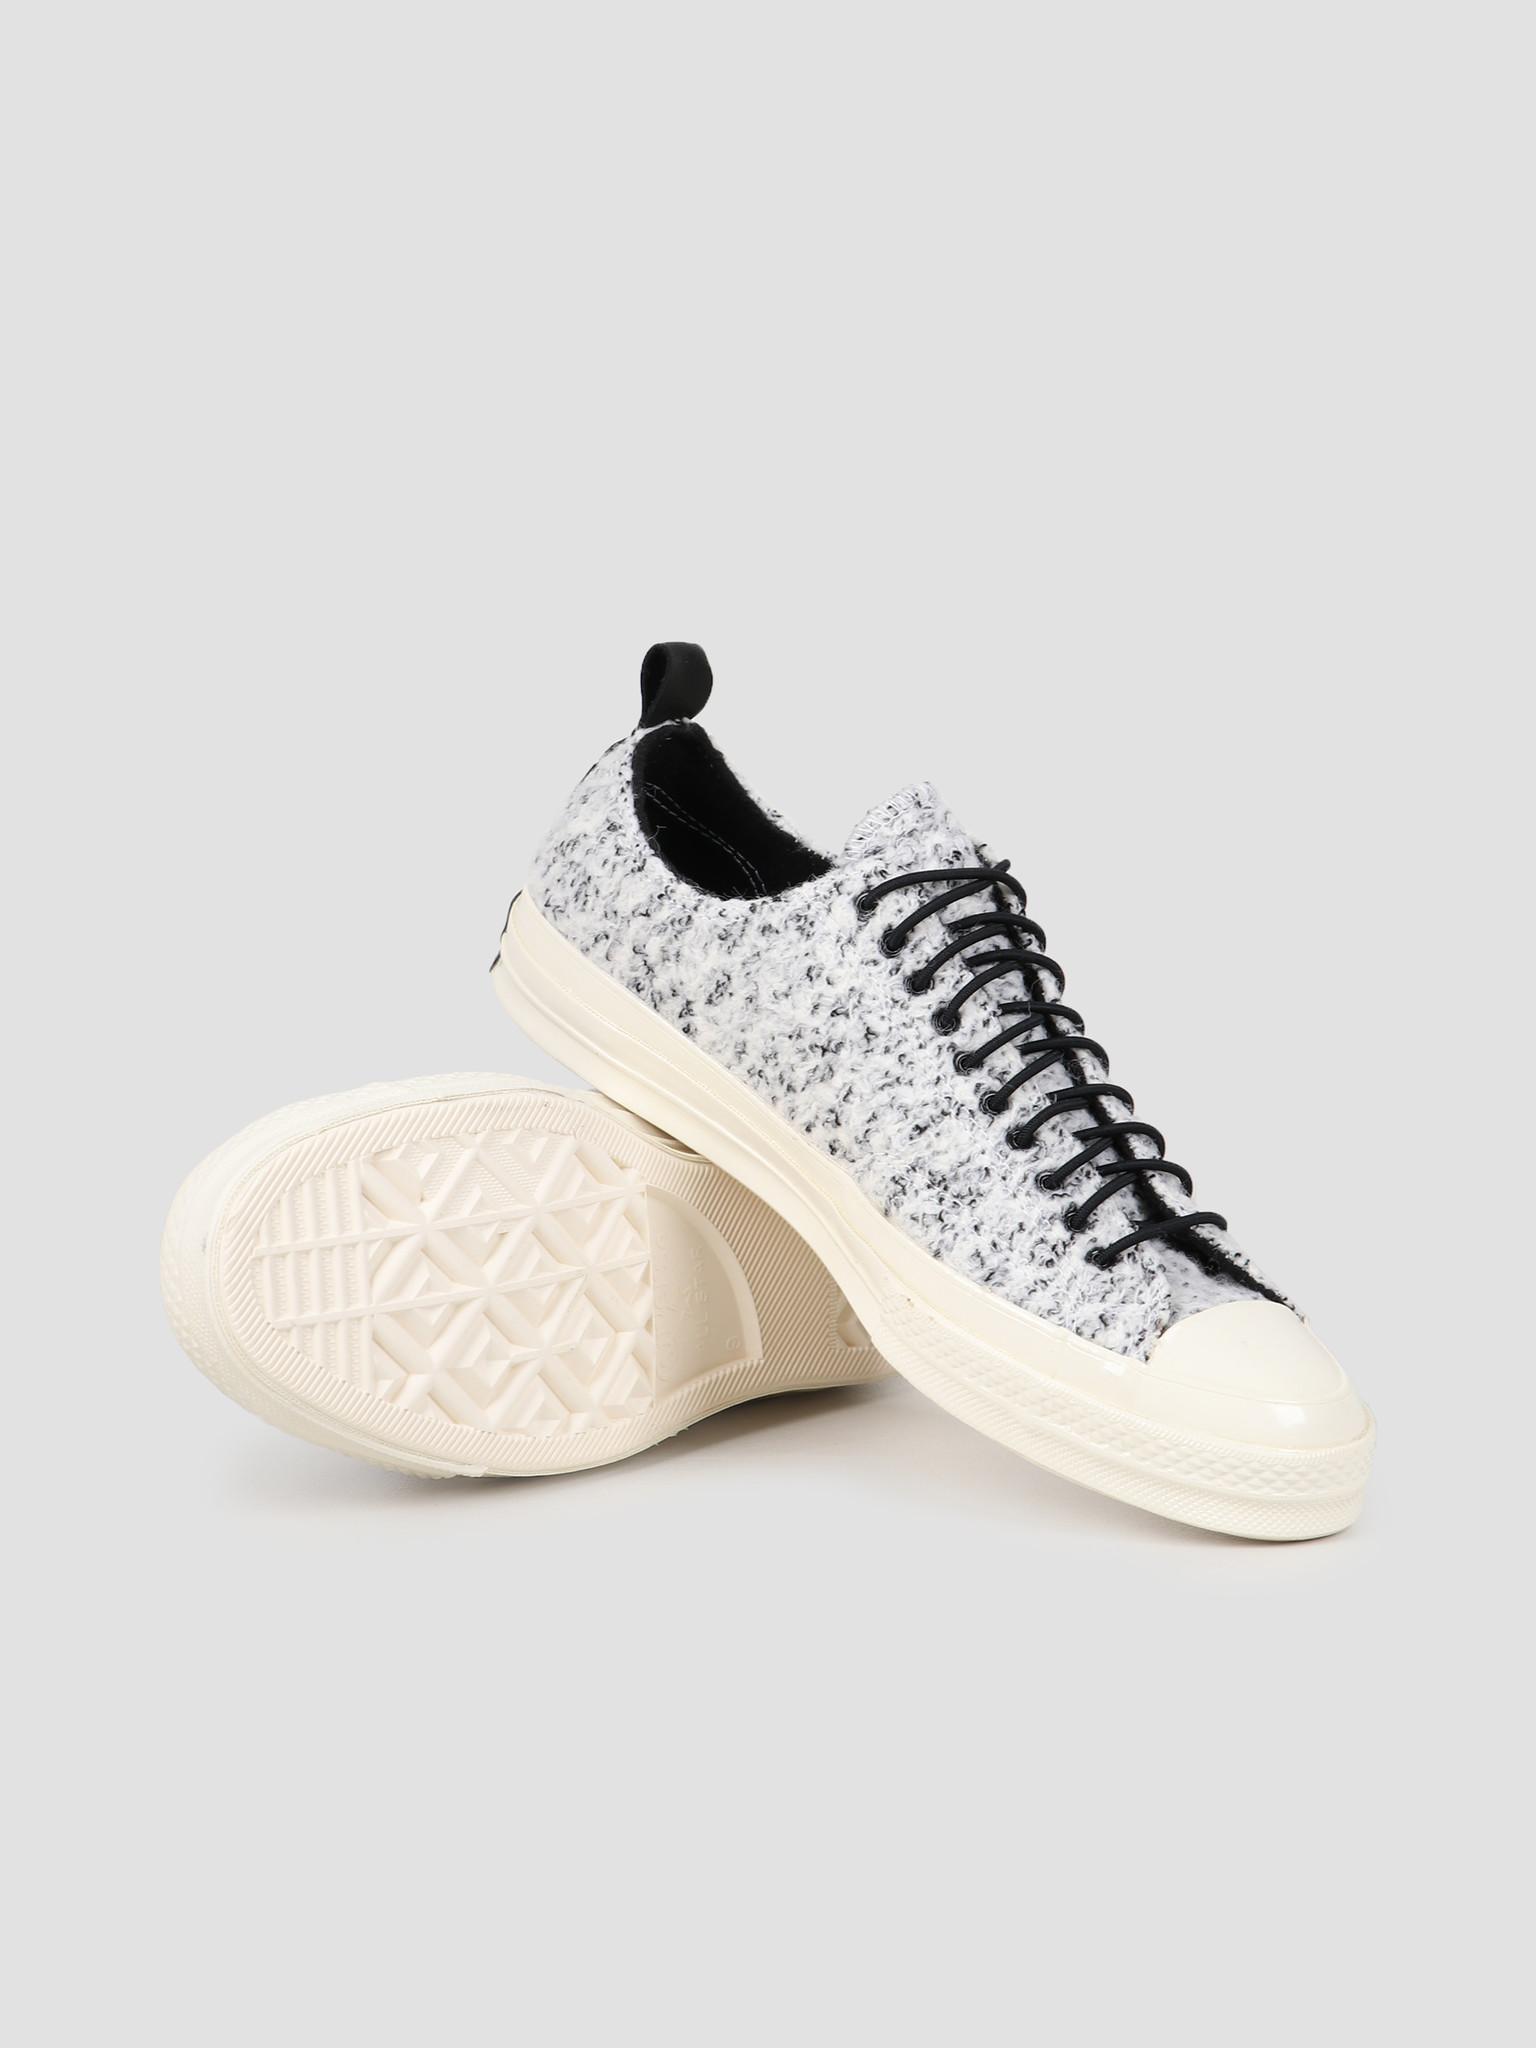 Converse Converse Chuck 70 OX White Black Egret 166254C